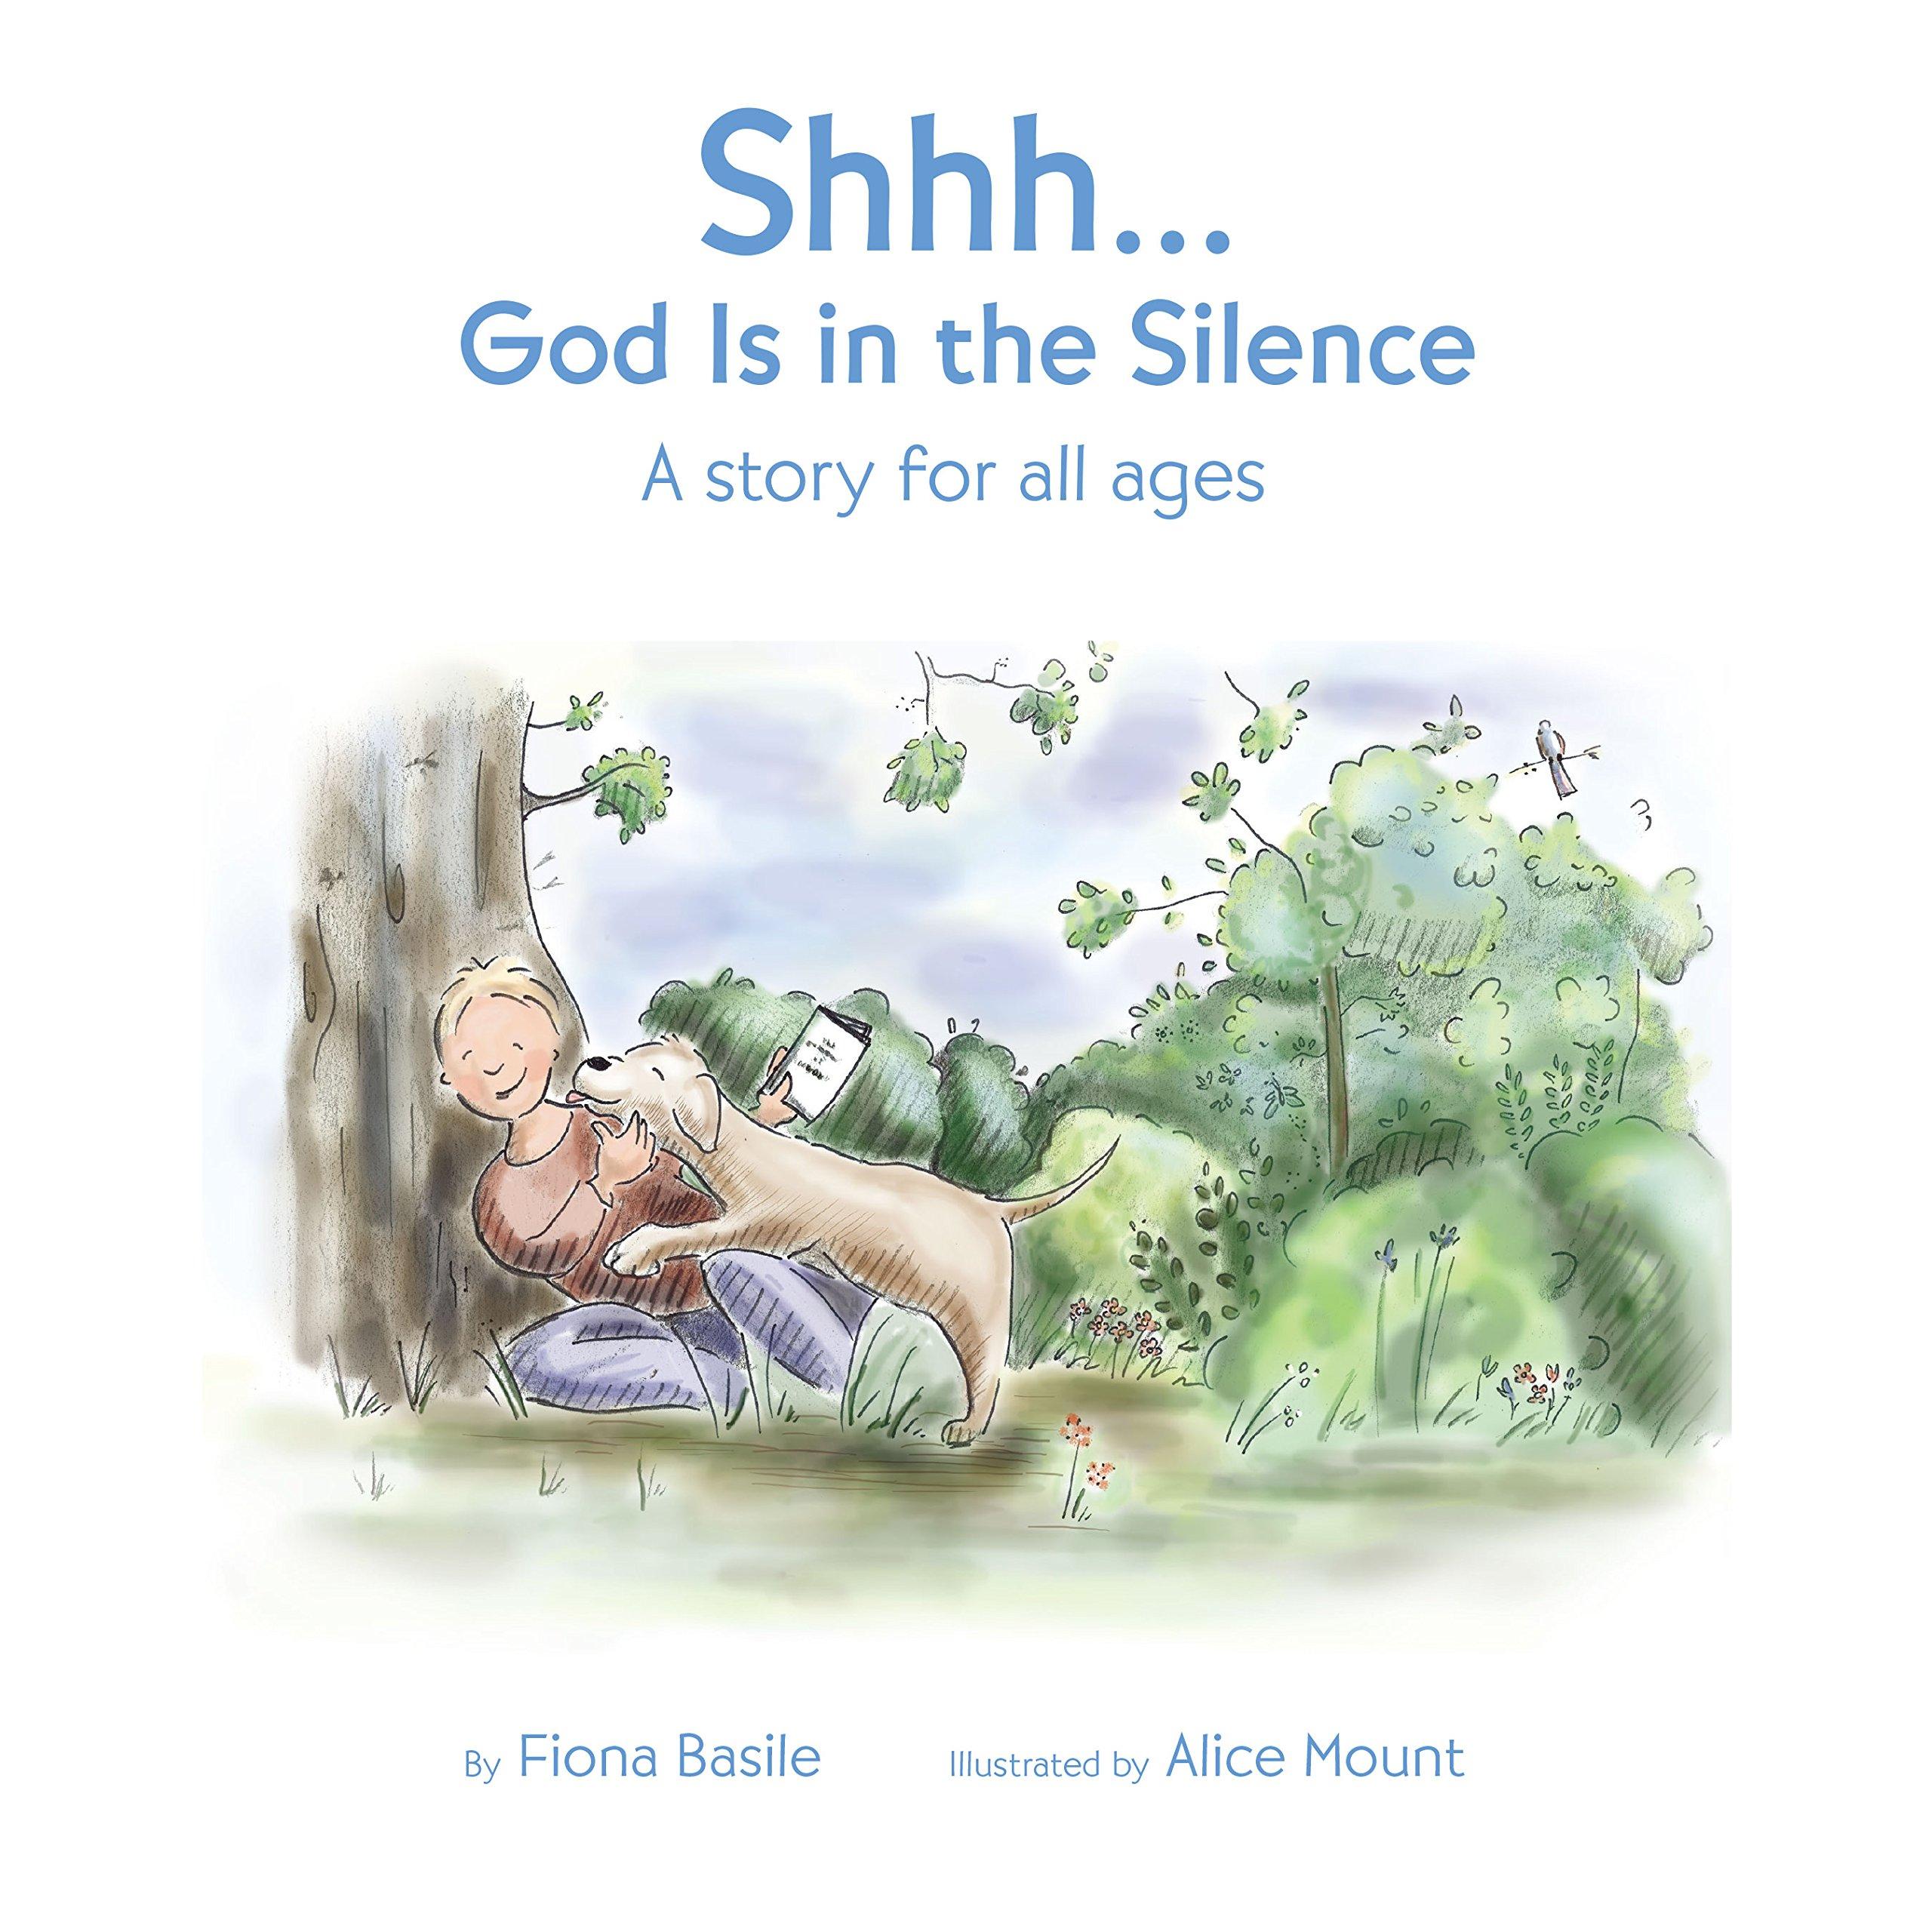 Shhhgod Is In The Silence Fiona Basile 9780829446579 Amazon